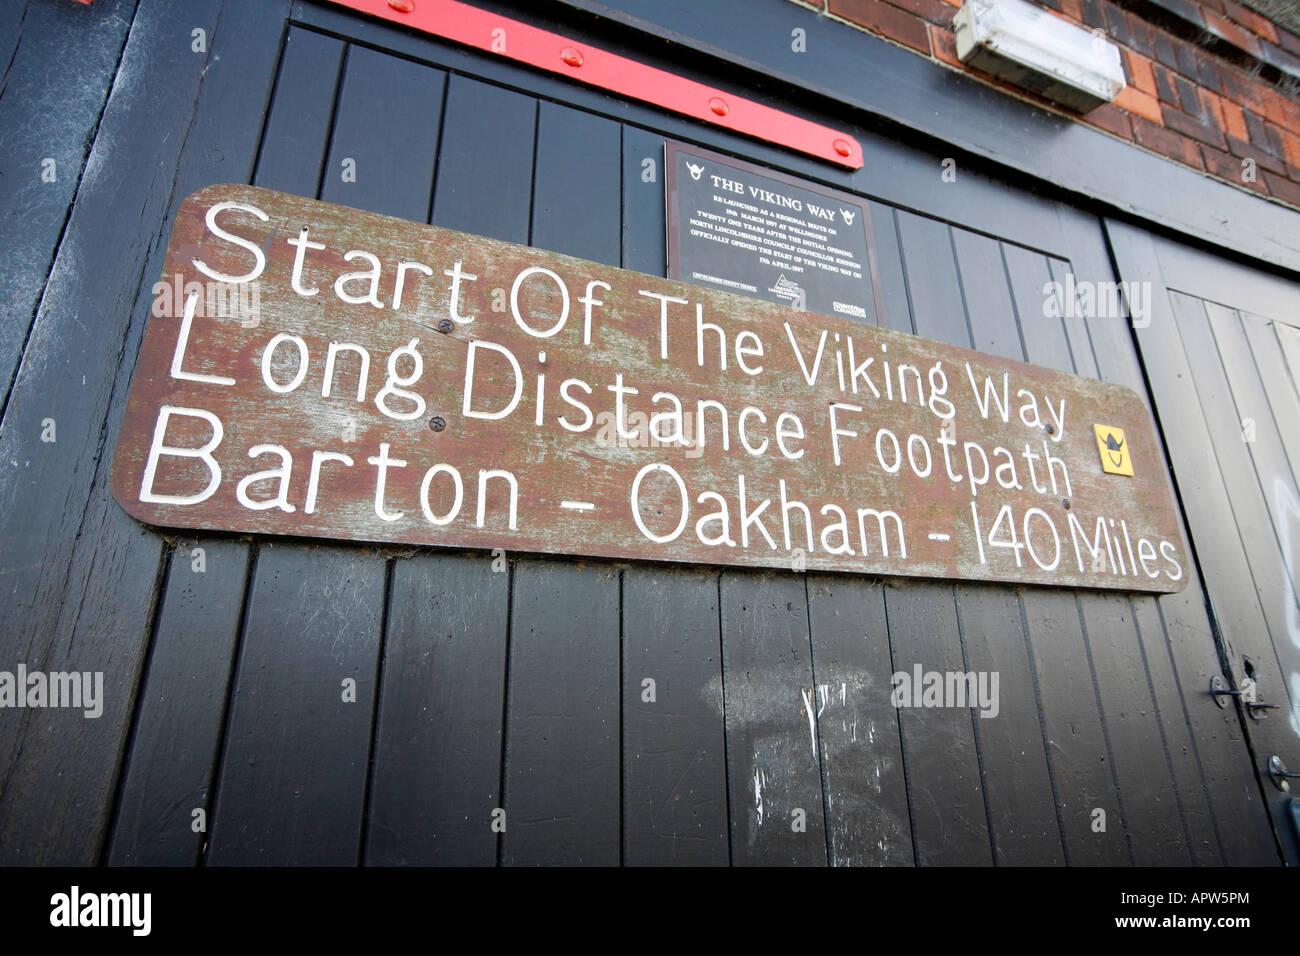 Sign indicating the start of the Viking Way, Barton upon Humber, Humberside - Stock Image